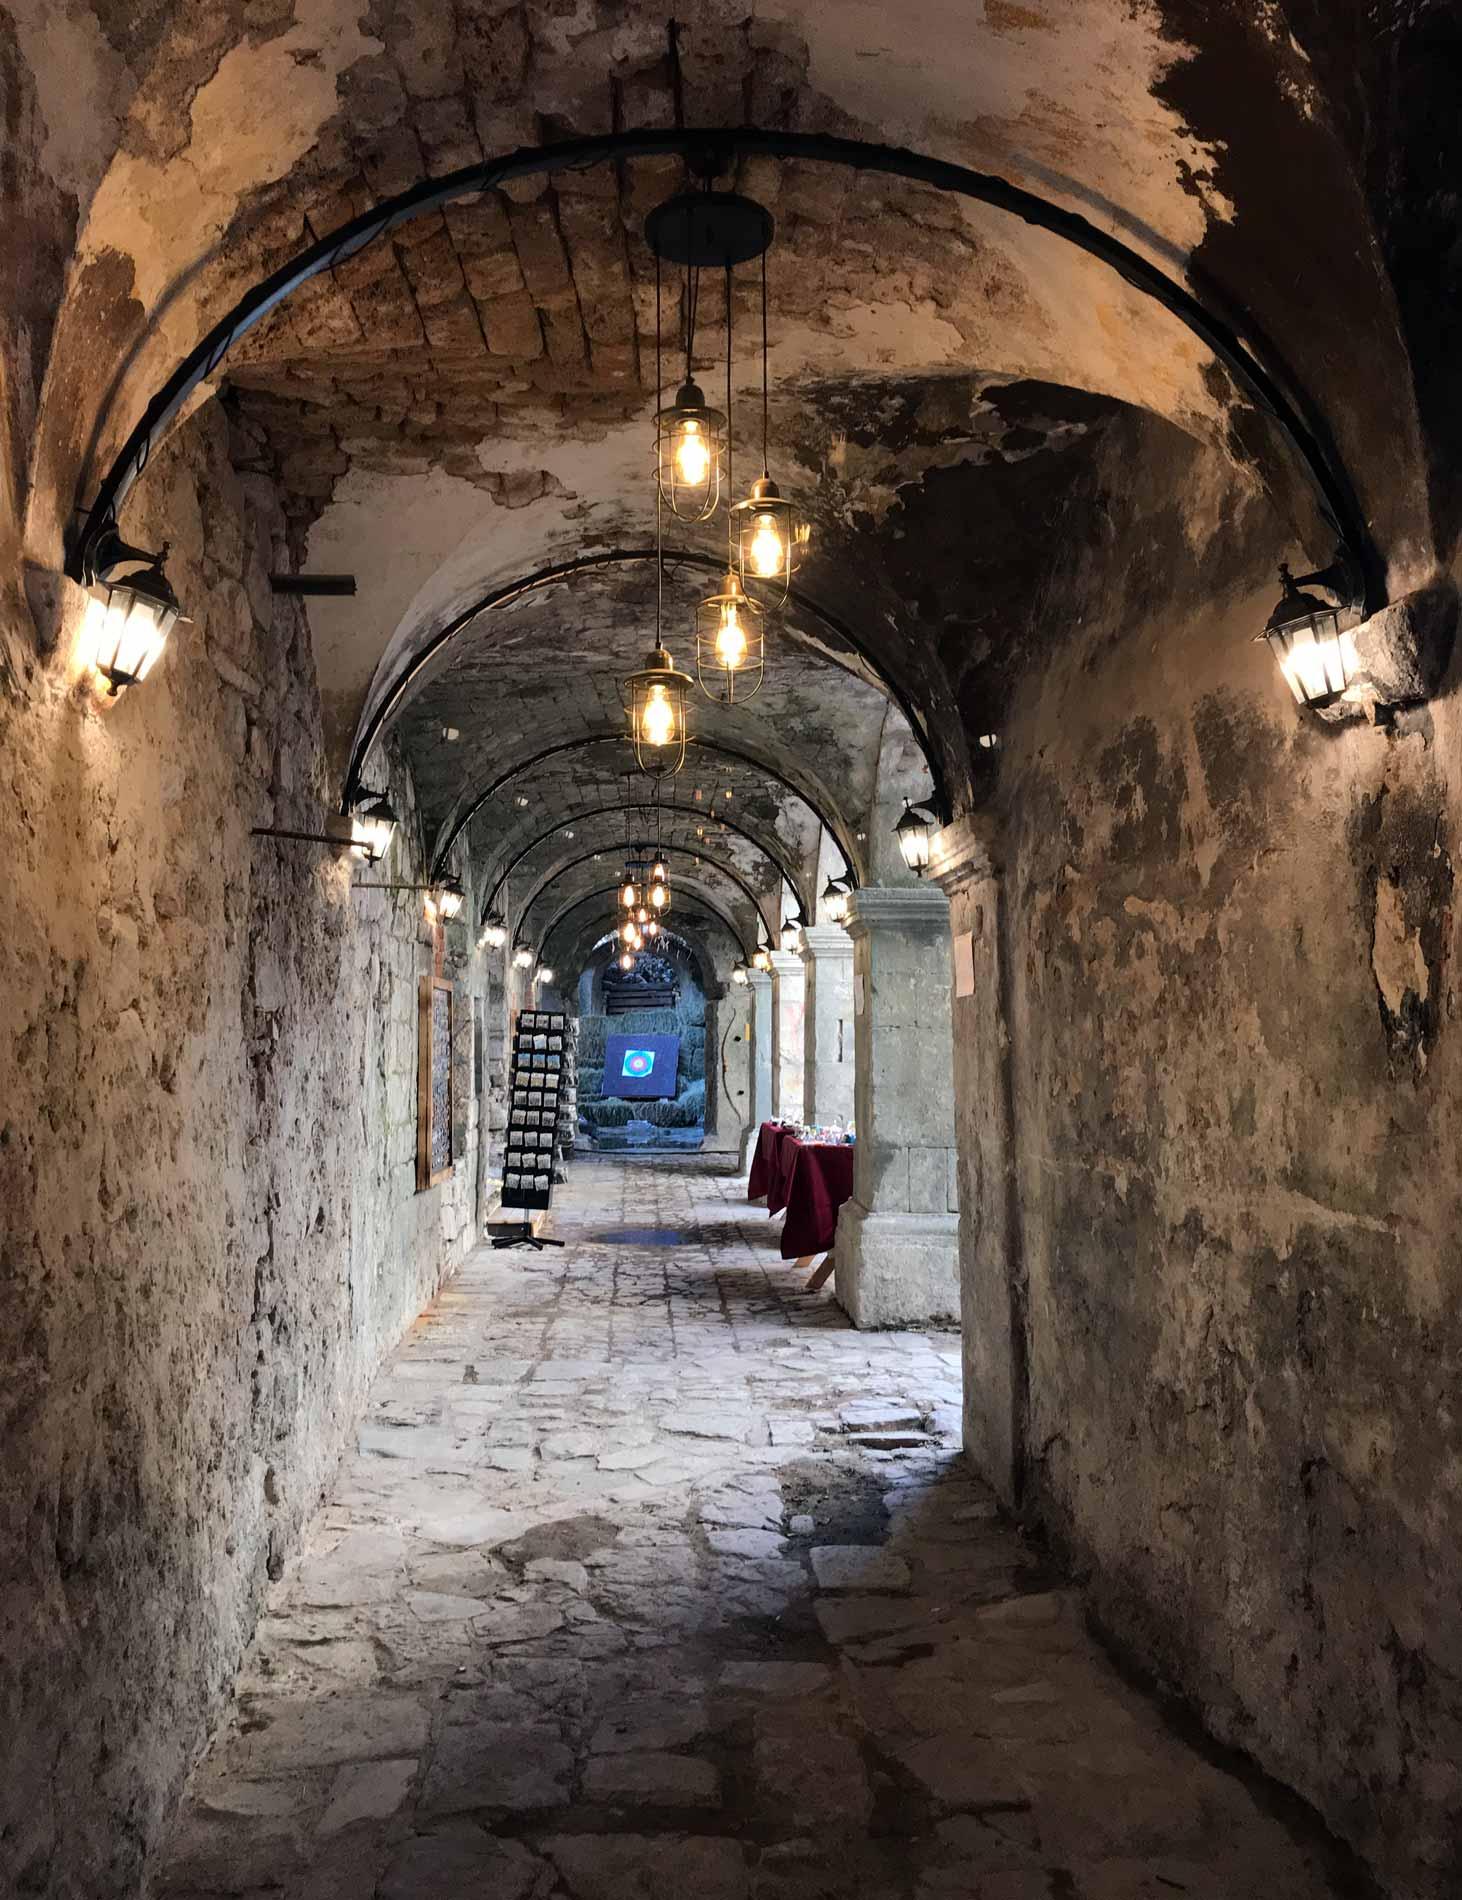 Kotor-Montenegro-Ulica1-bazar-corridoio-luci-arcate